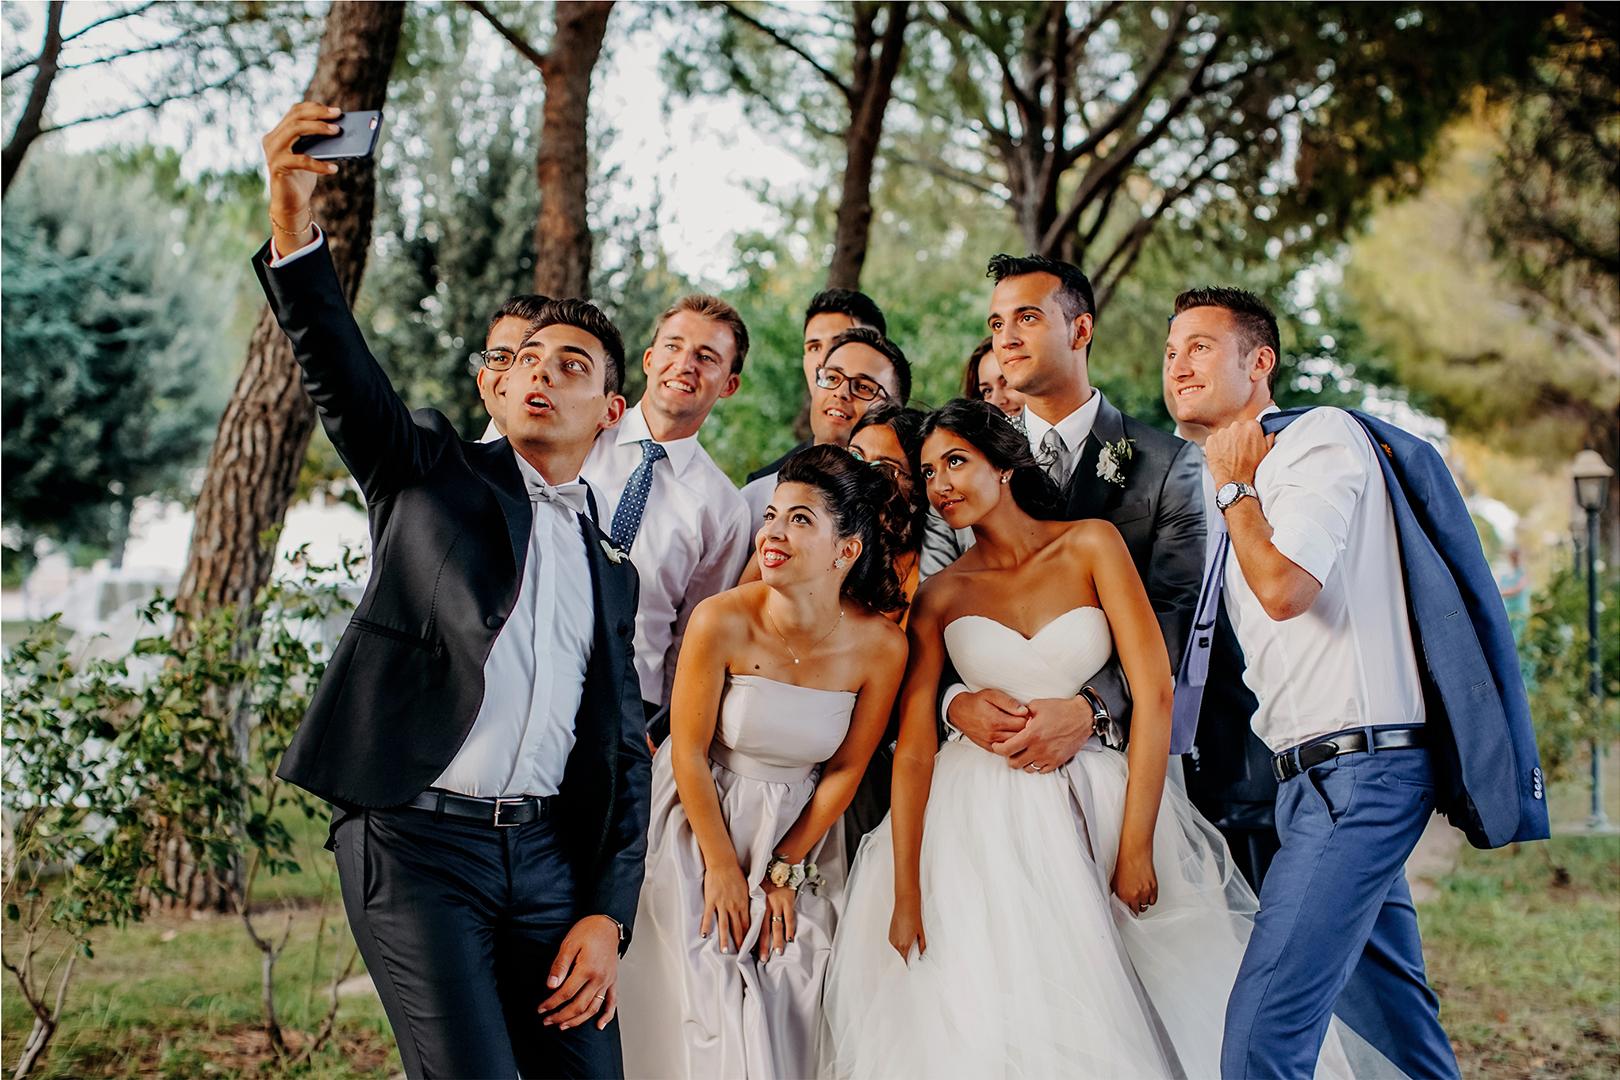 75 gianni-lepore-cellulare-foto-amici-sposi-bride-groom-selfie